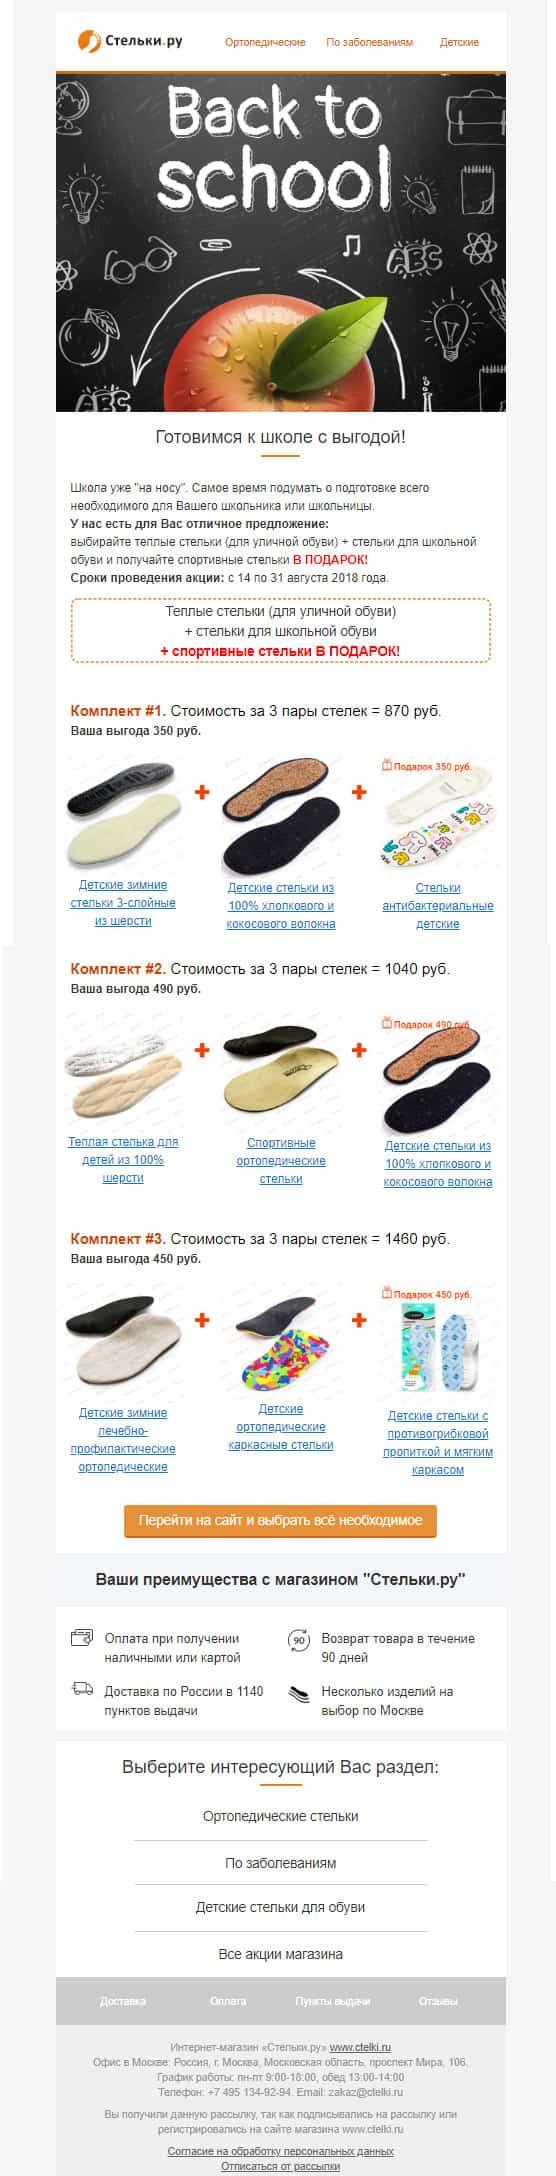 Первое промописьмо «Стельки.ру»